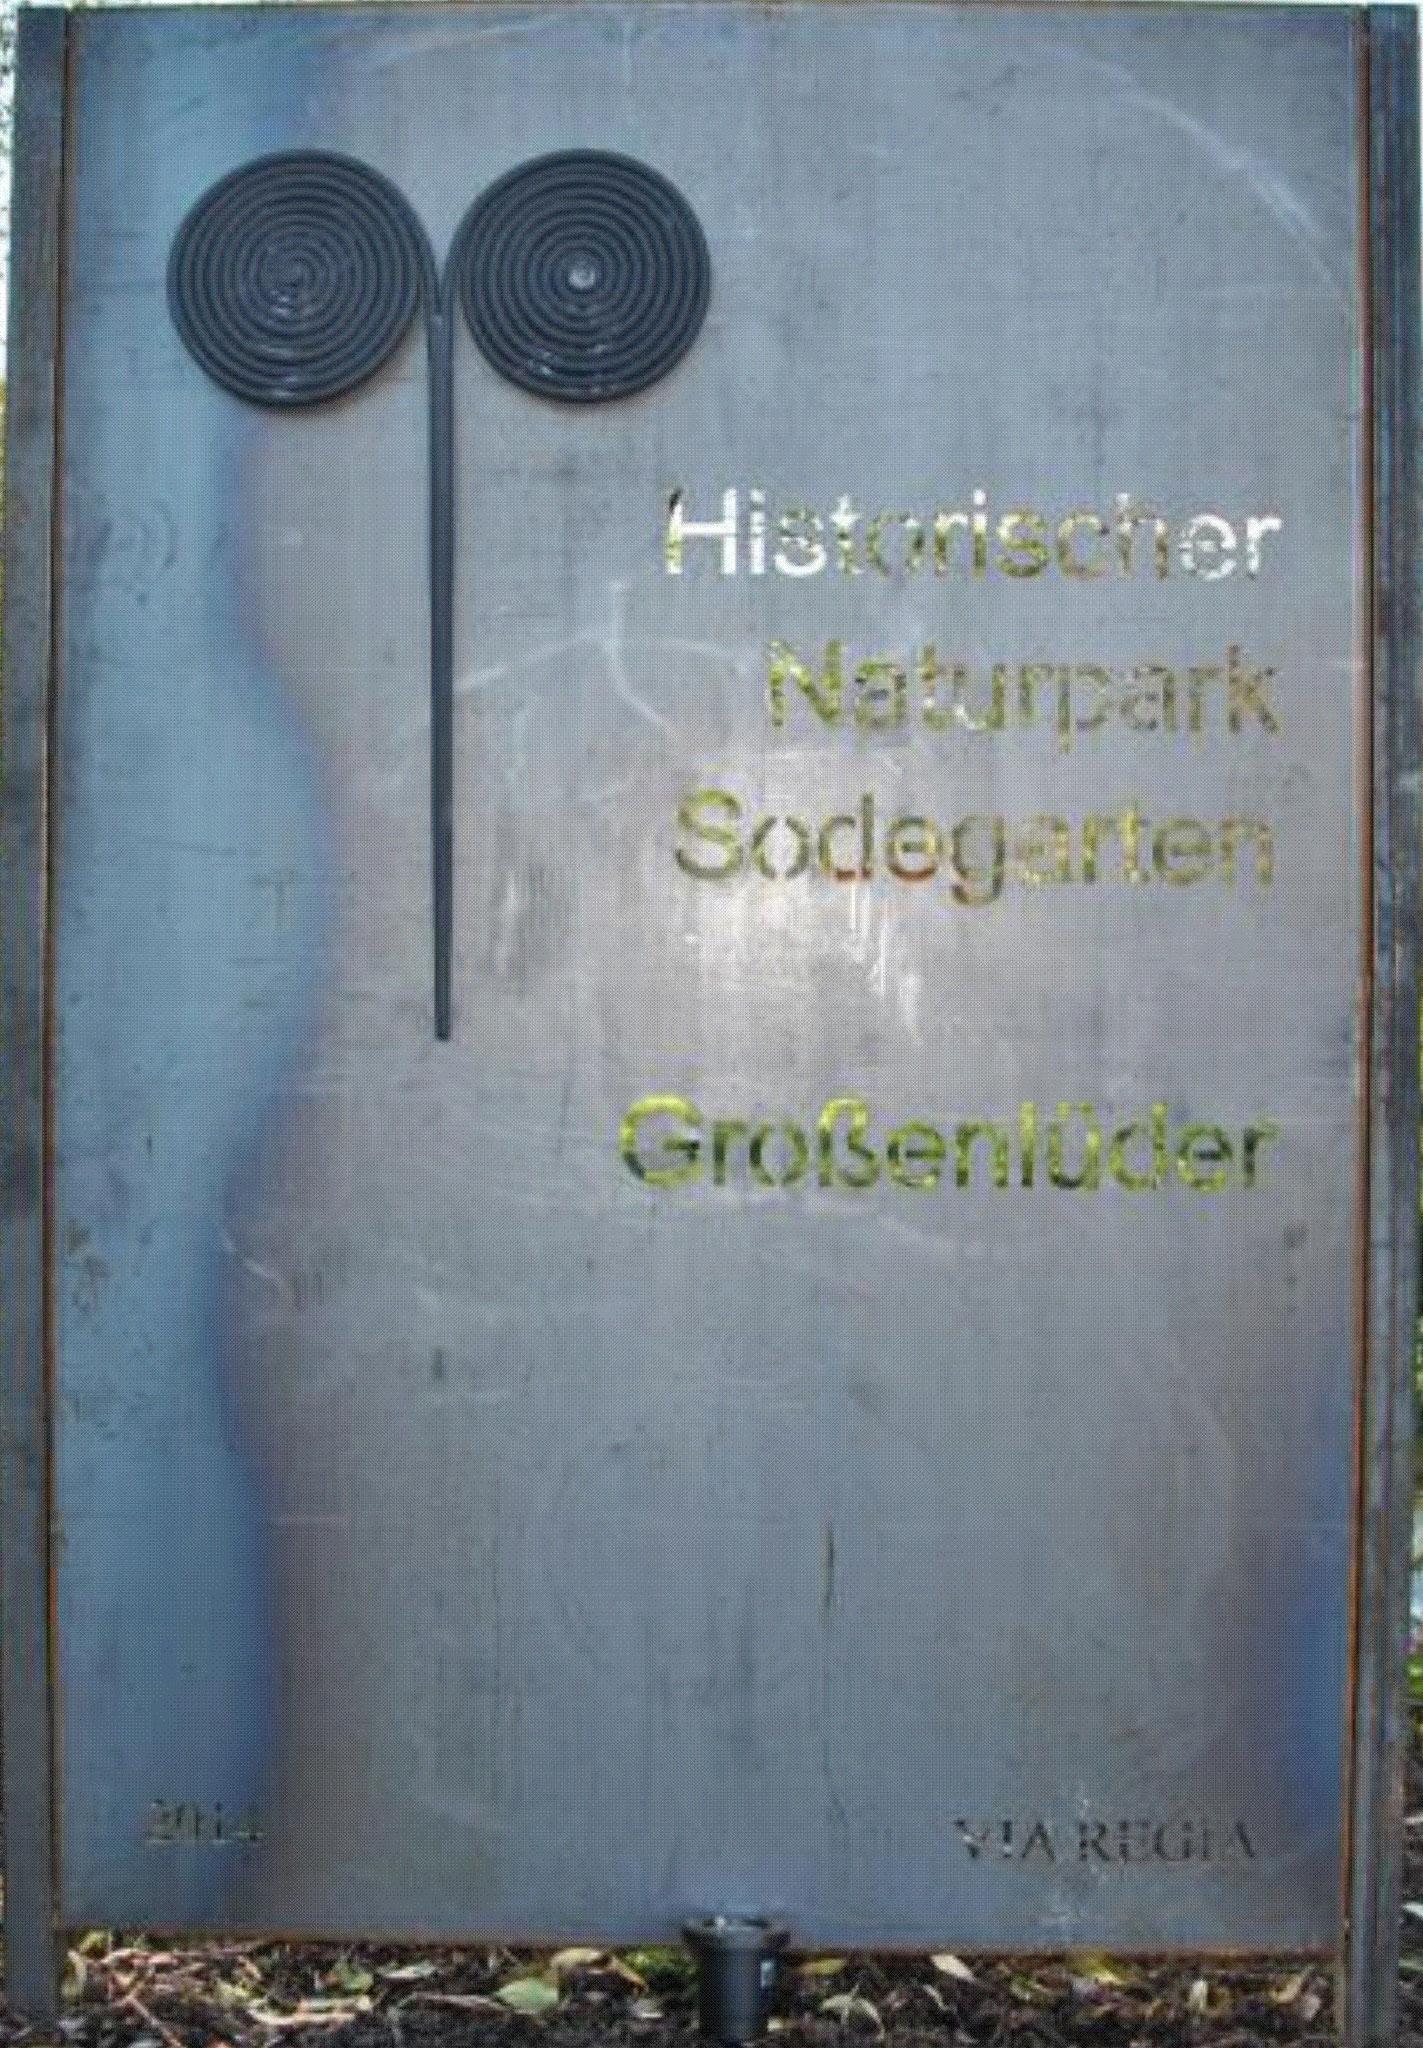 https://www.grossenlueder.de/seite/365519/historischer-naturpark-sodegarten.html